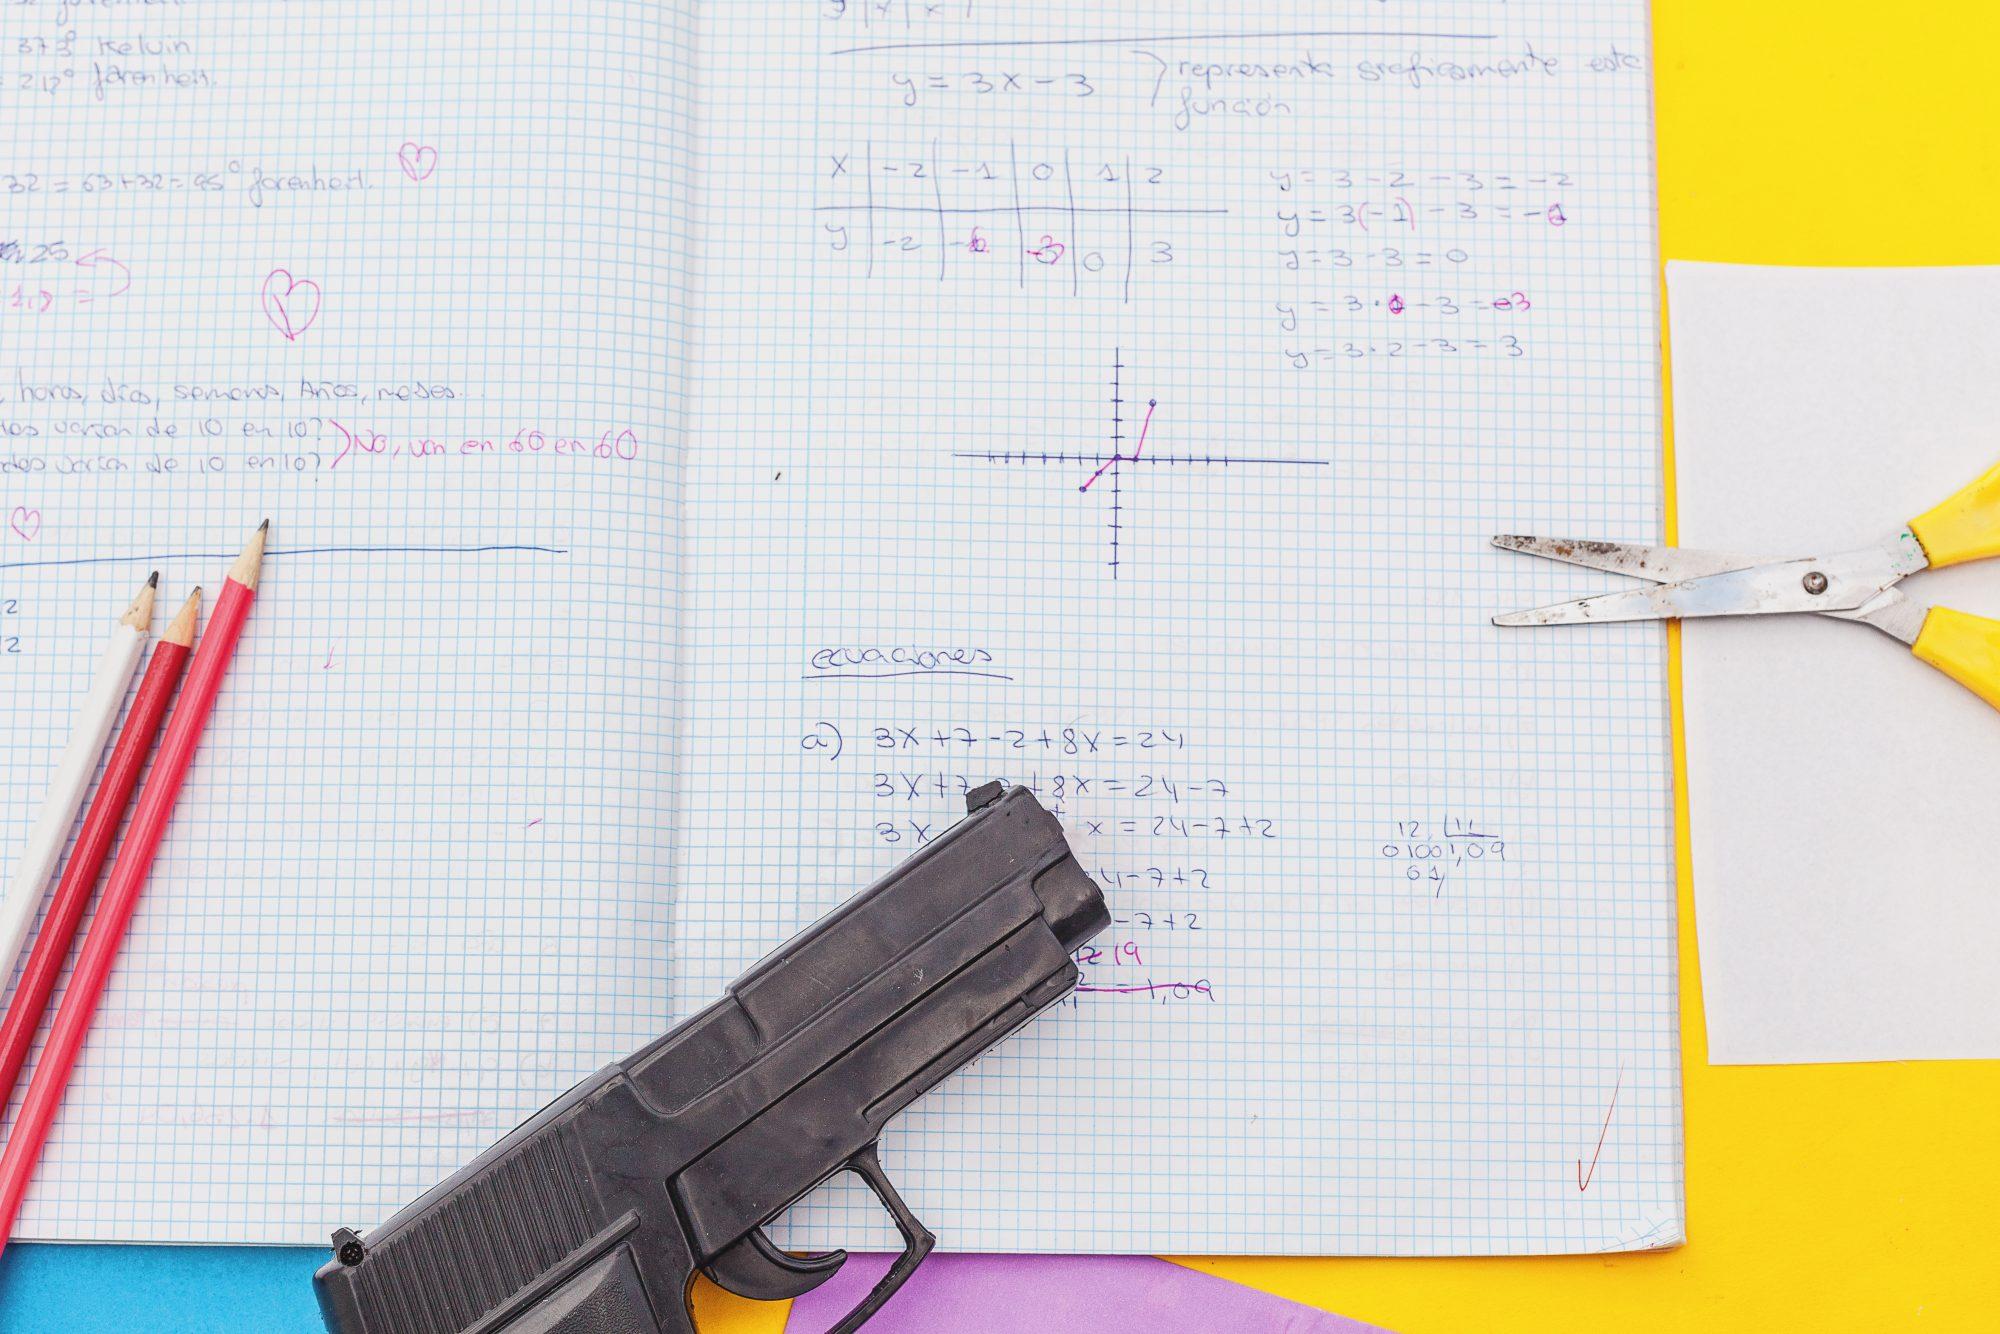 gun control school